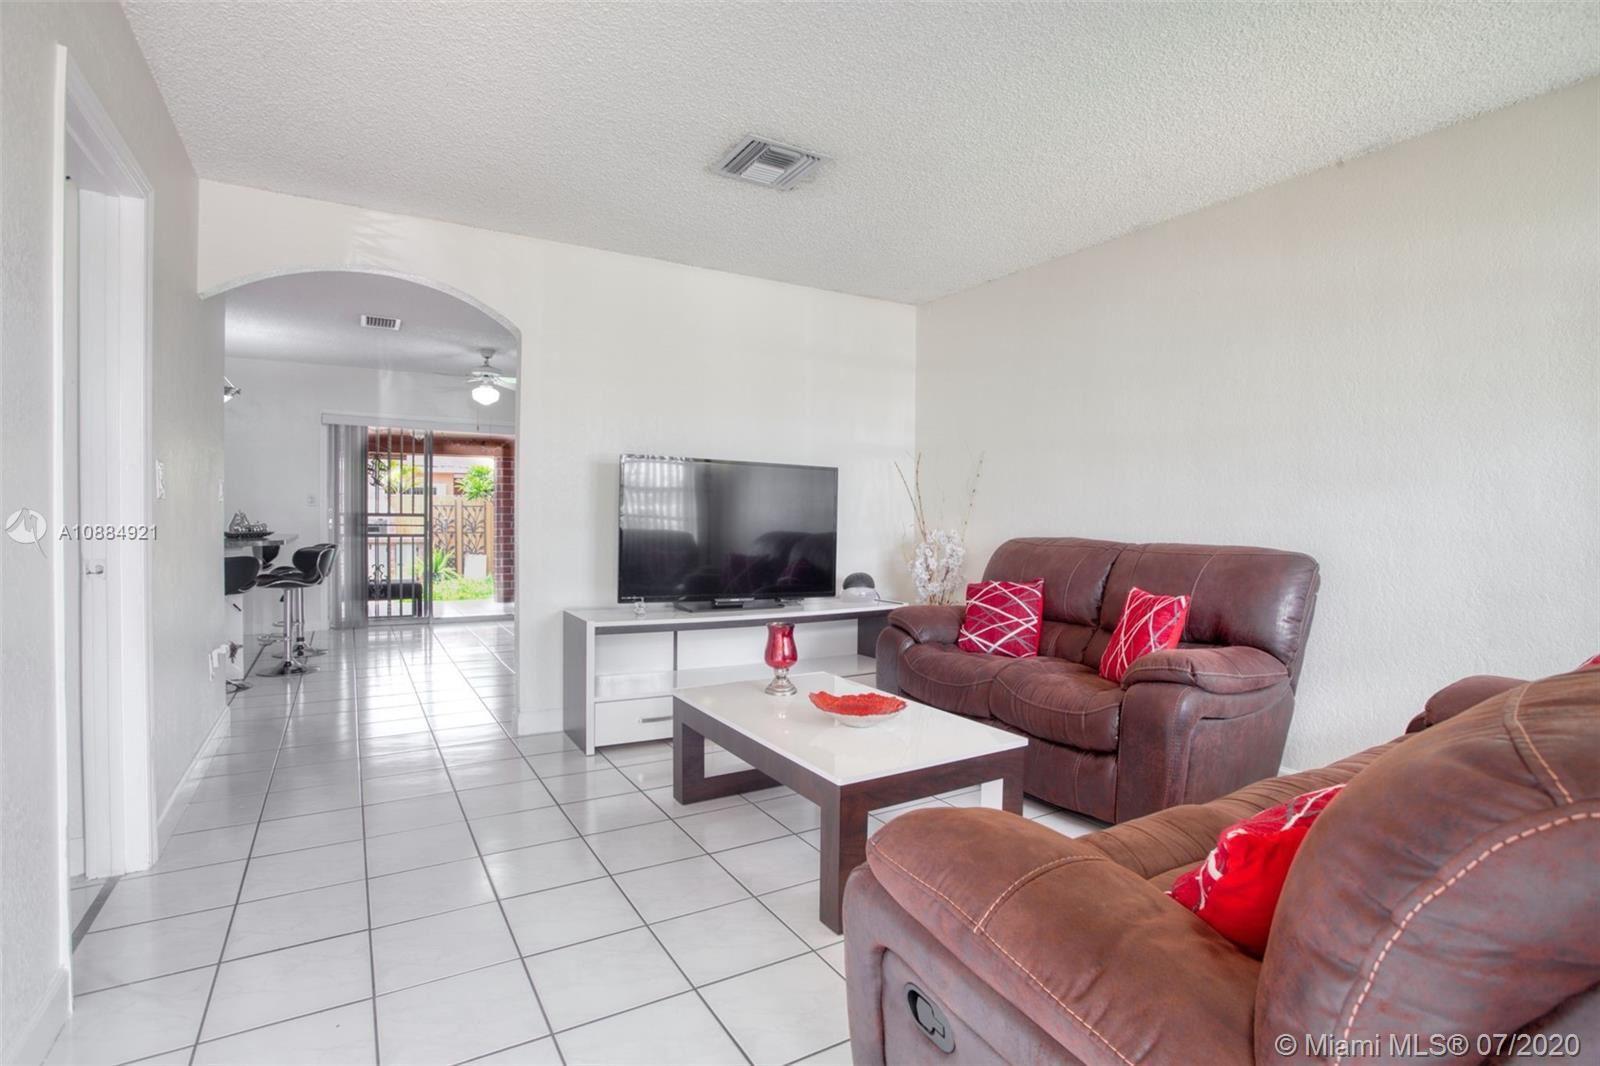 13044 SW 43rd Ln #N\/A, Miami, FL 33175 - #: A10884921